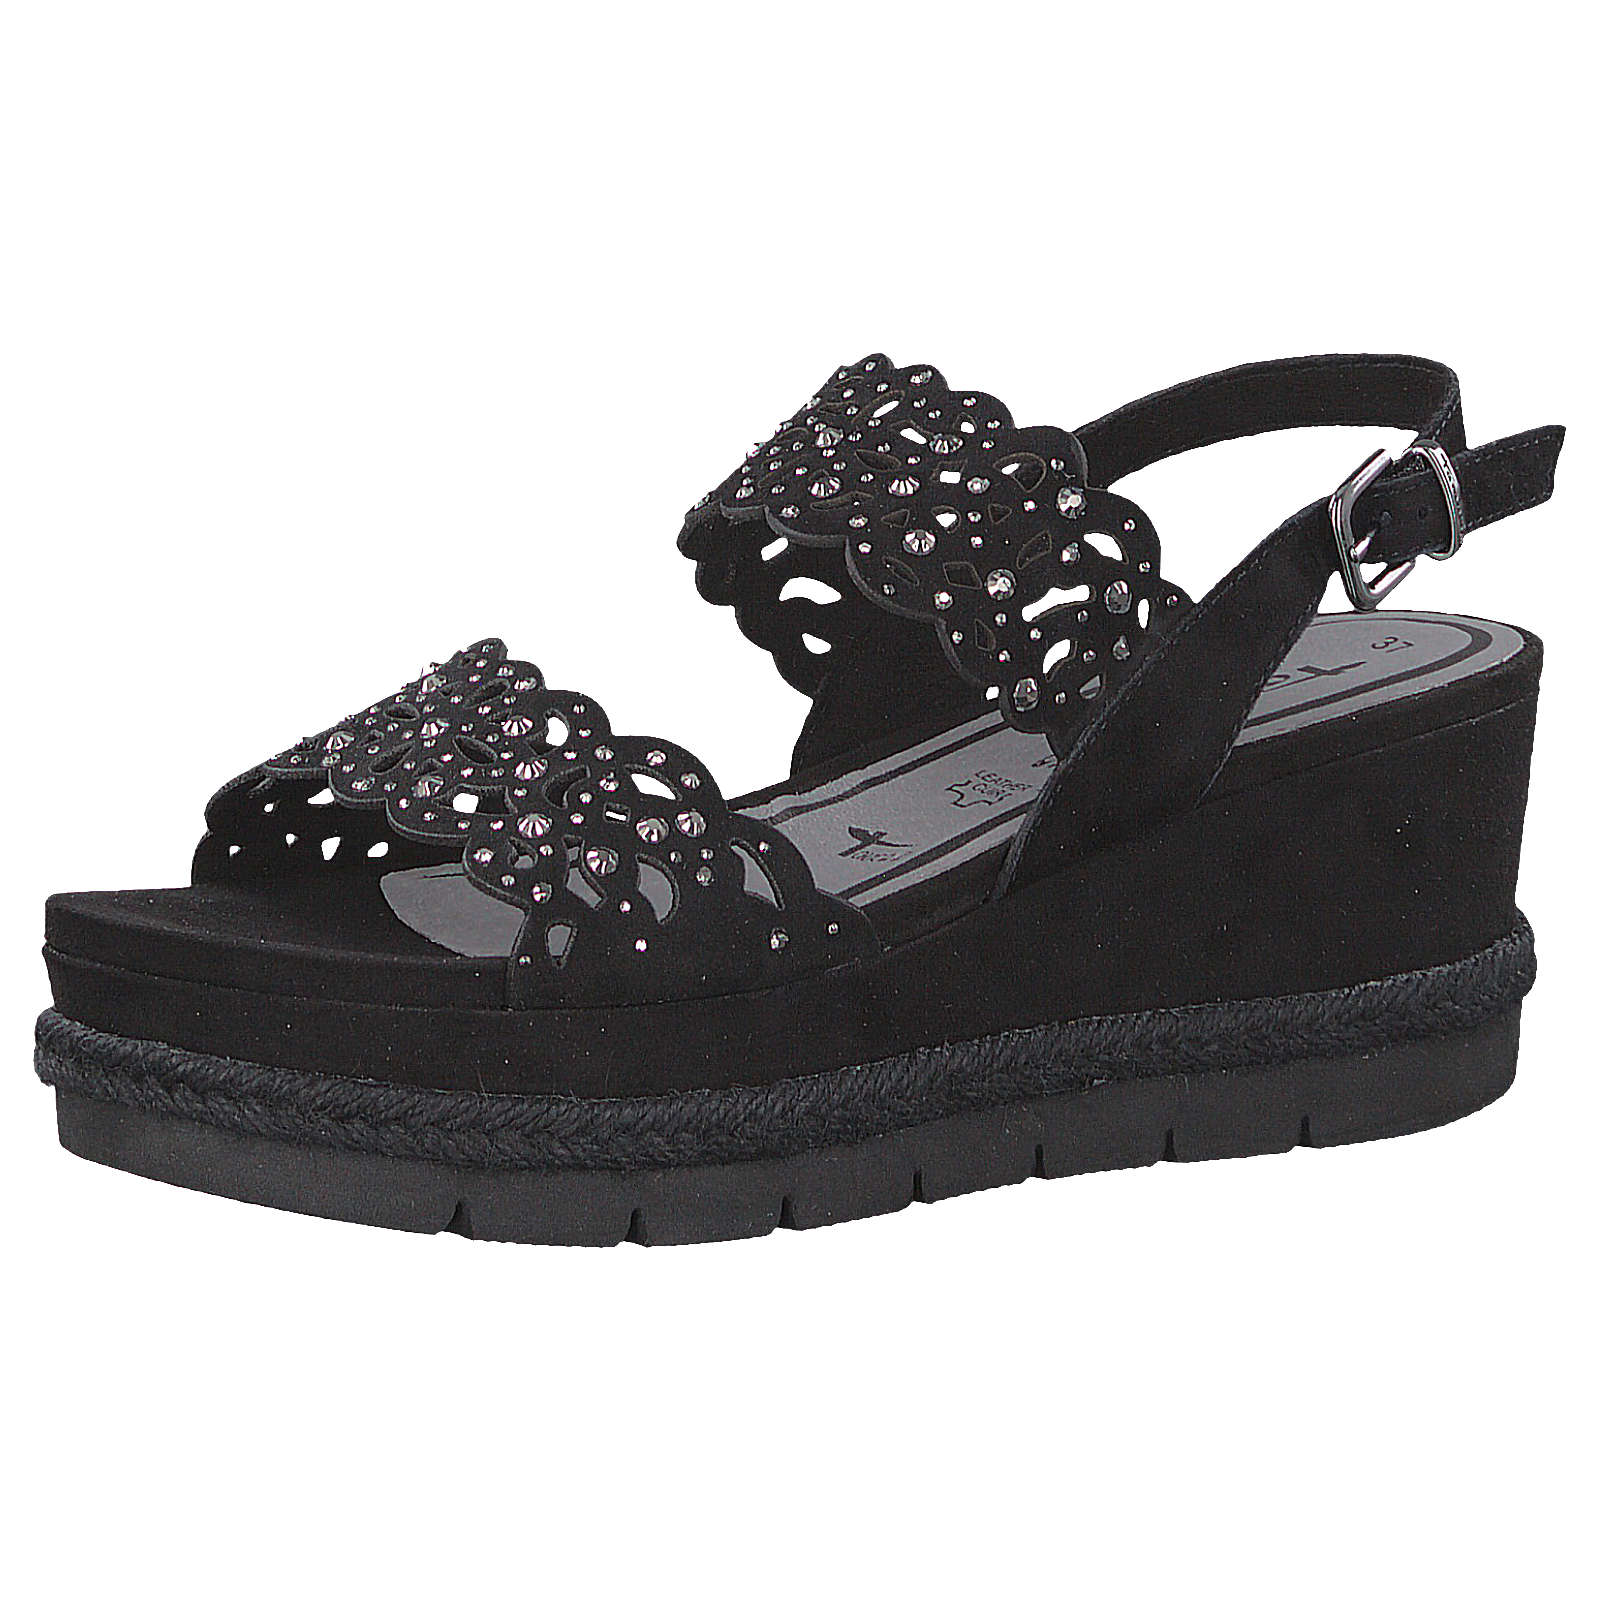 Tamaris Plateau-Sandaletten schwarz Damen Gr. 40